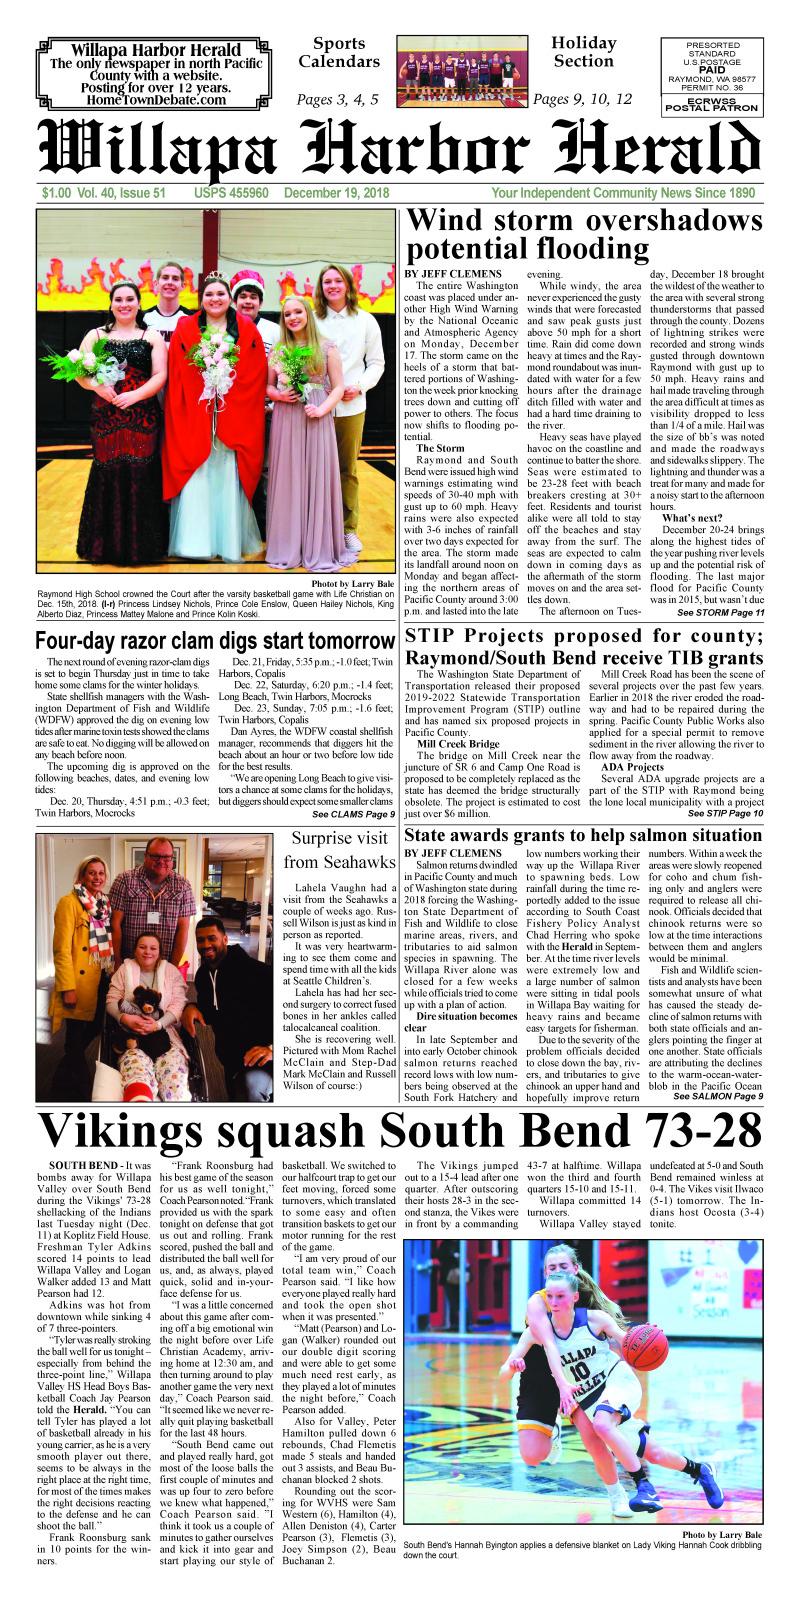 December 19, 2018 Willapa Harbor Herald